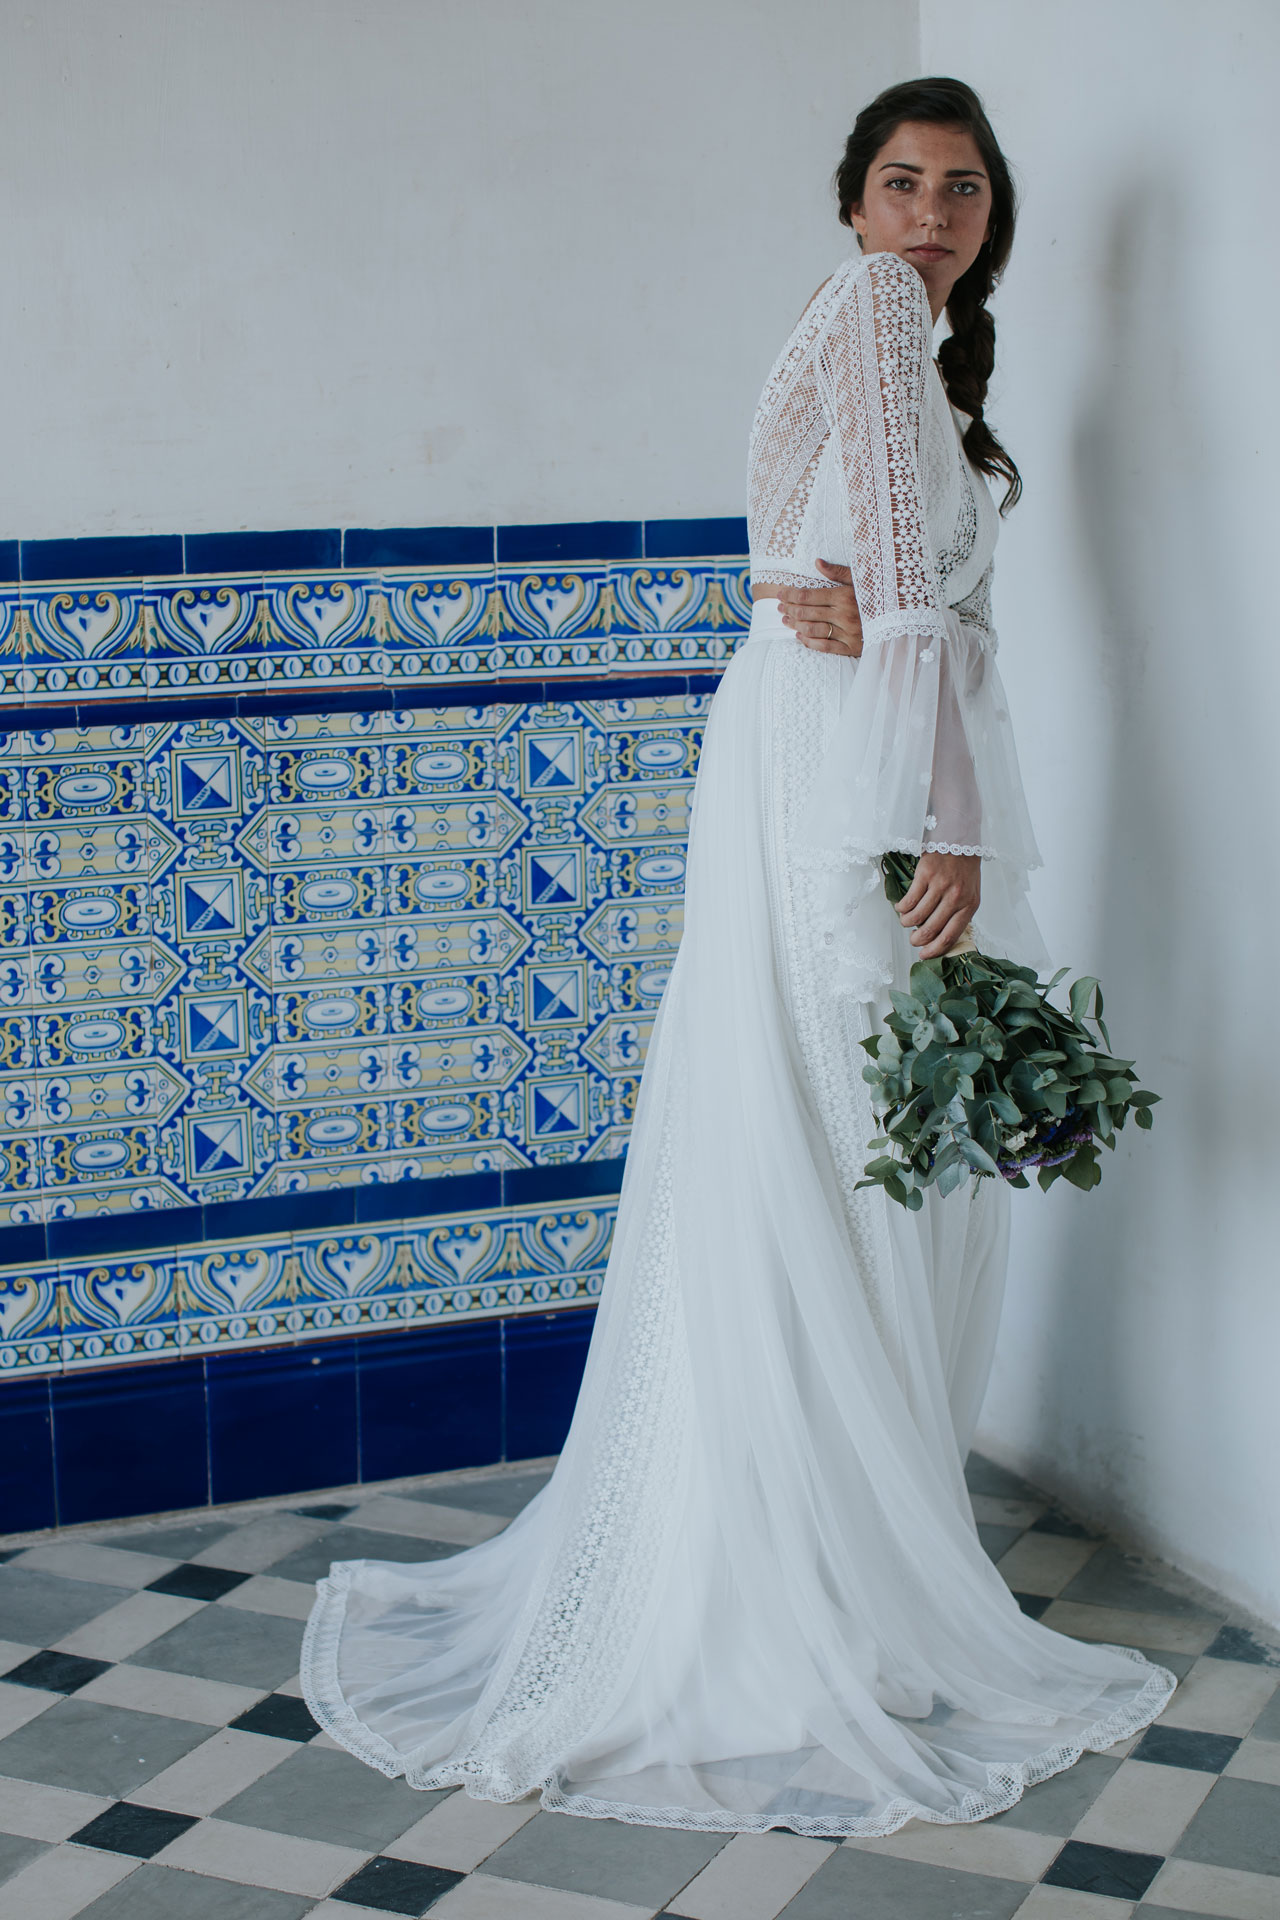 Vestit de núvia Yolanda / L'AVETIS